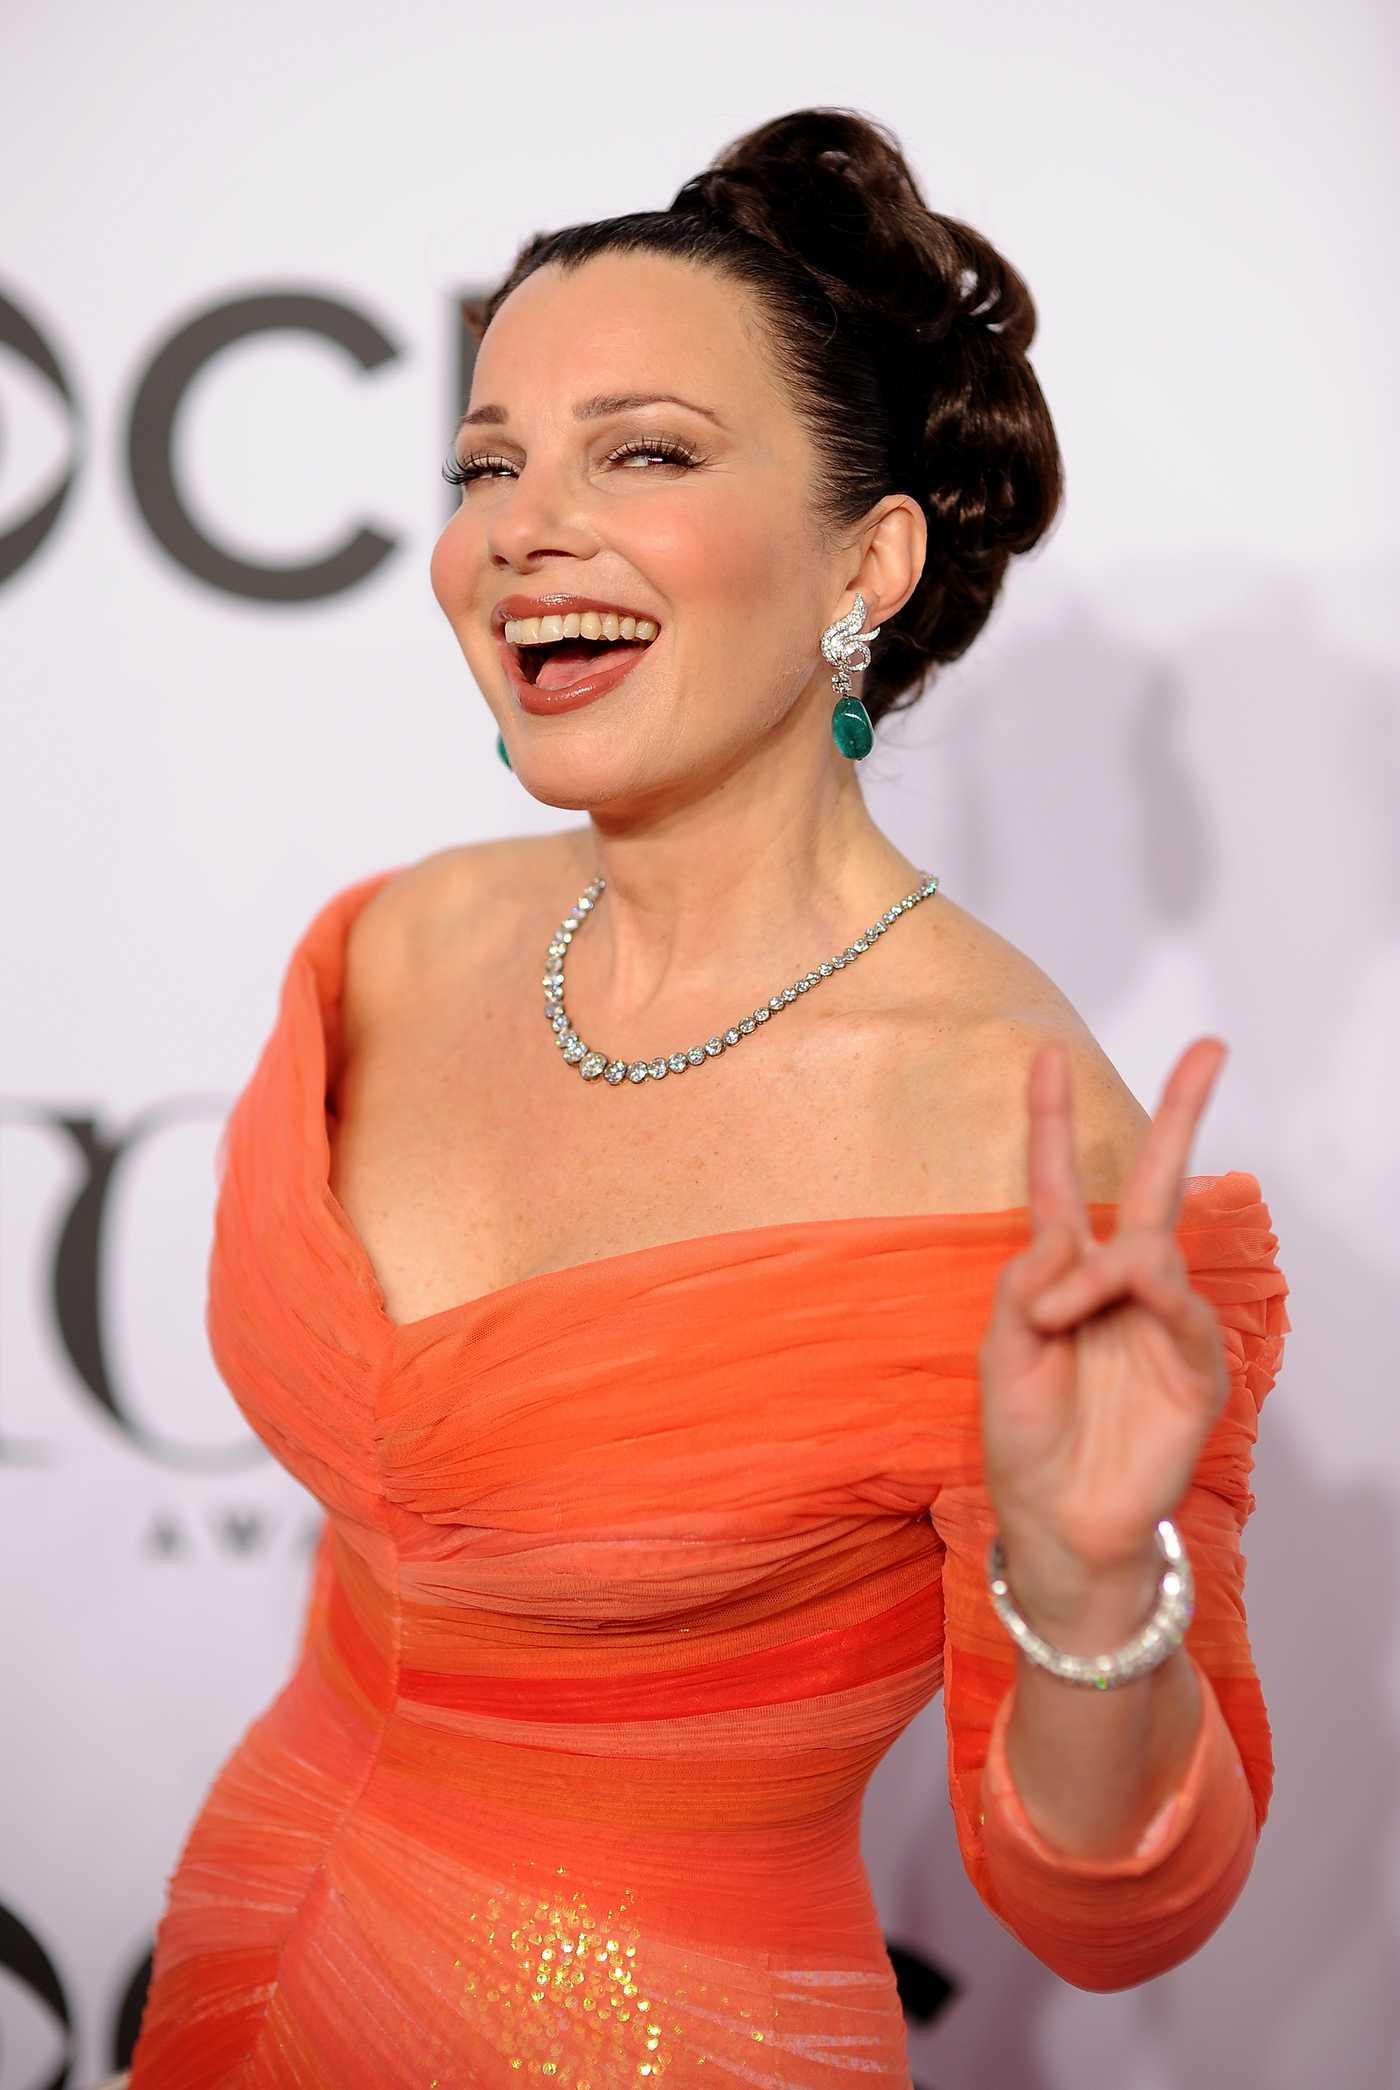 Fran Drescher Annual Tony Awards in New York